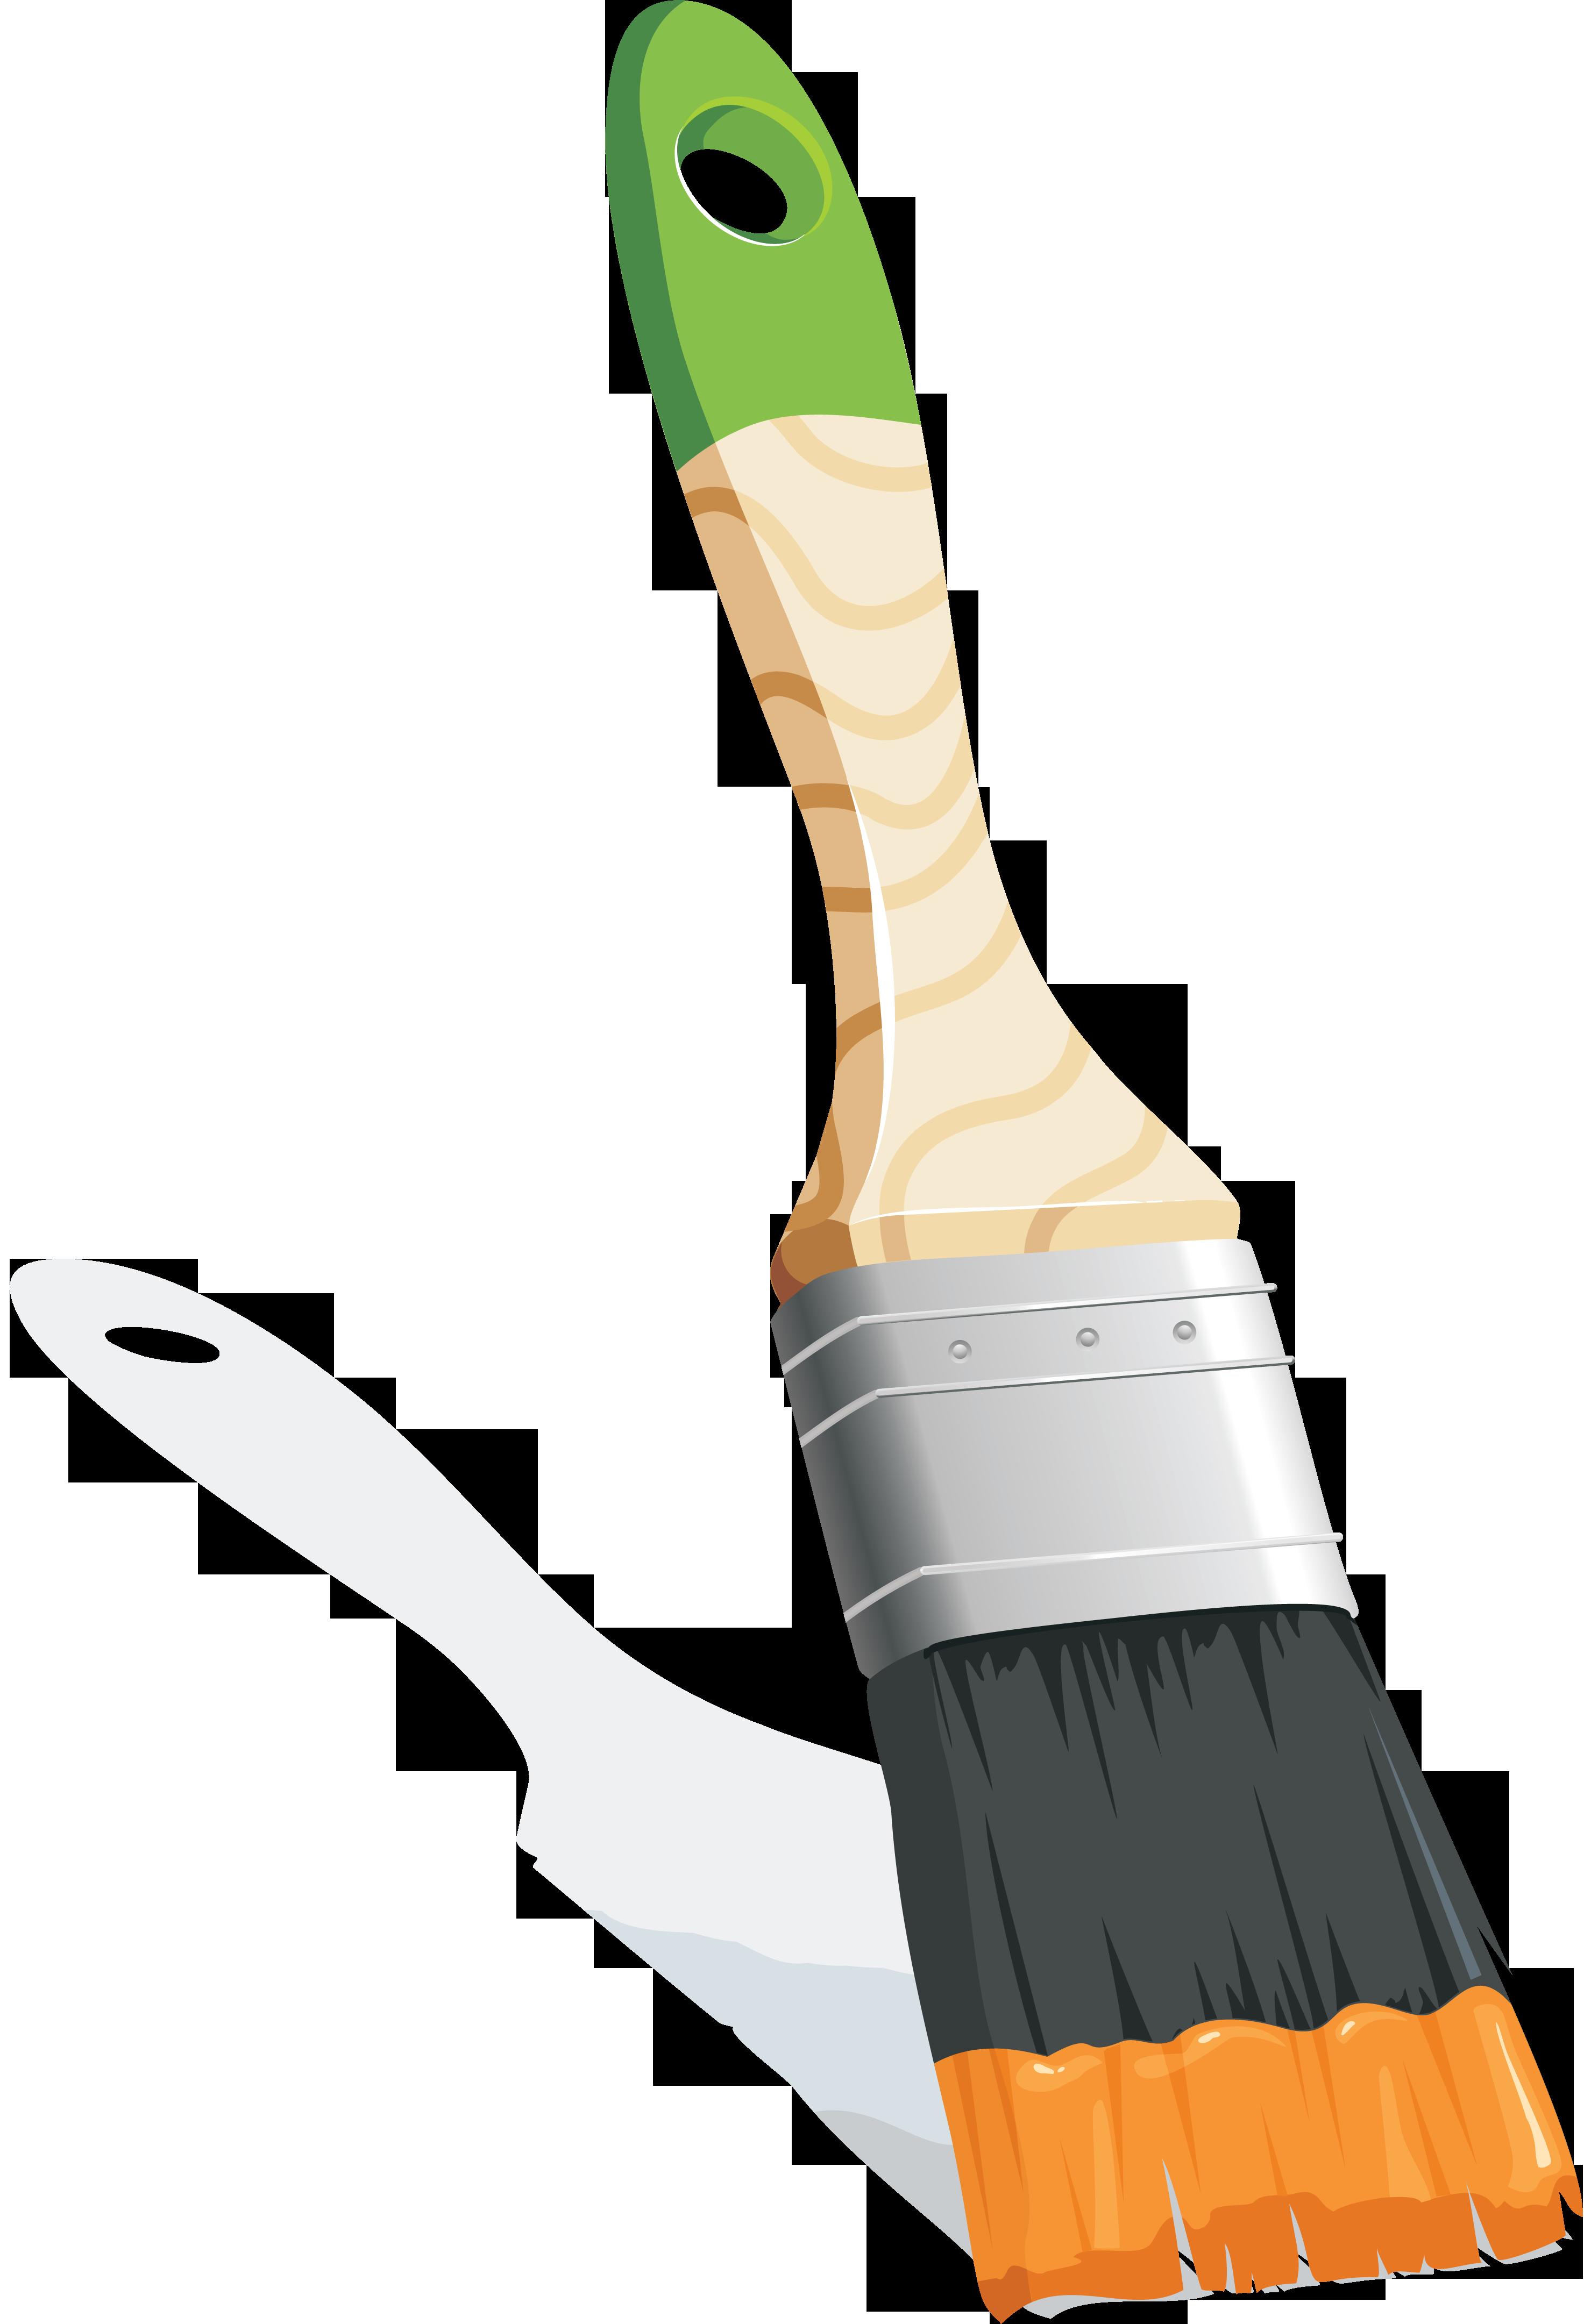 Paint Brush Png Image Paint Brushes Painting Brush